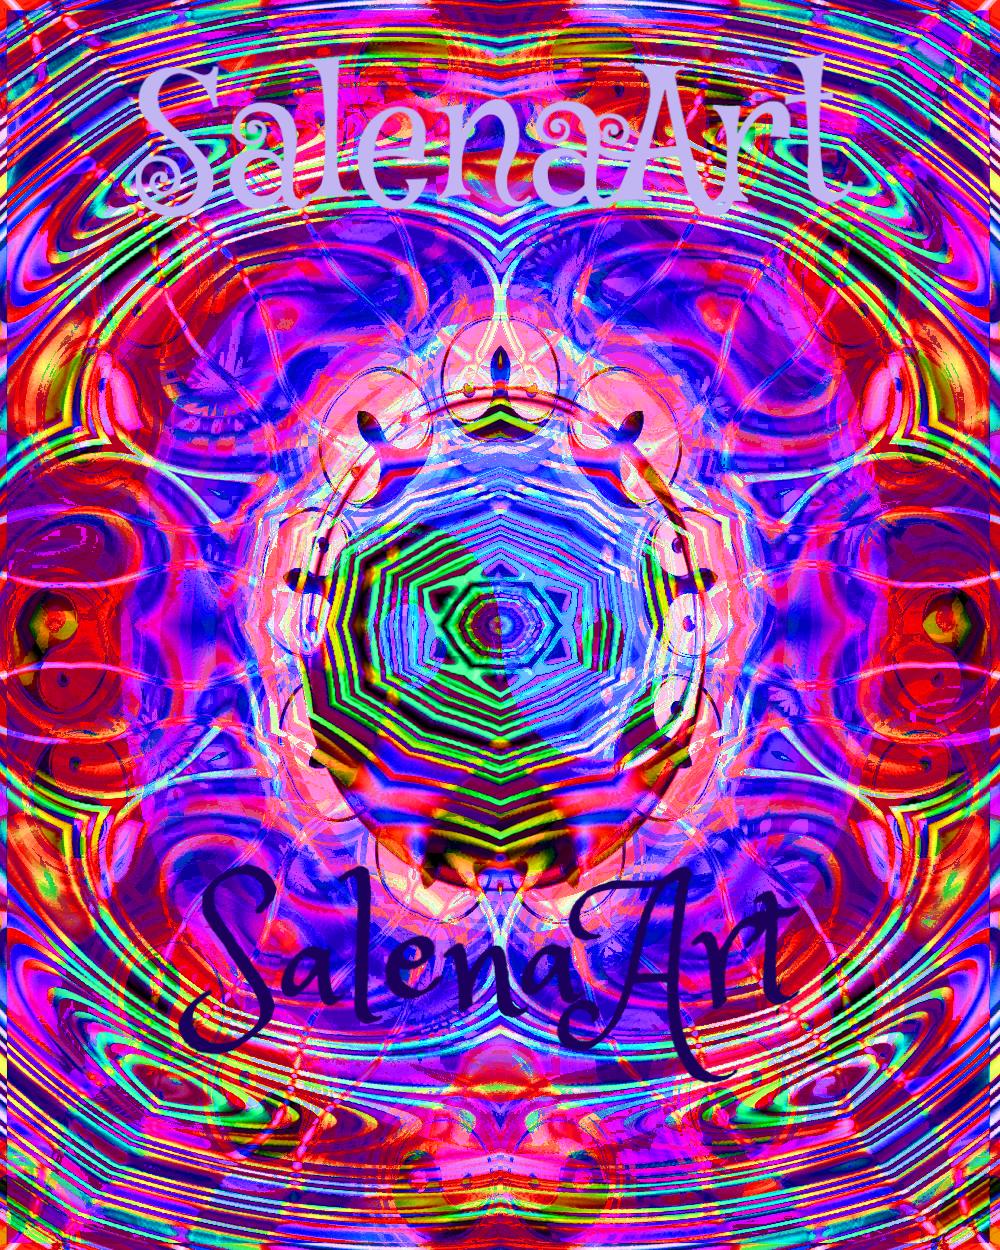 Image77_edited